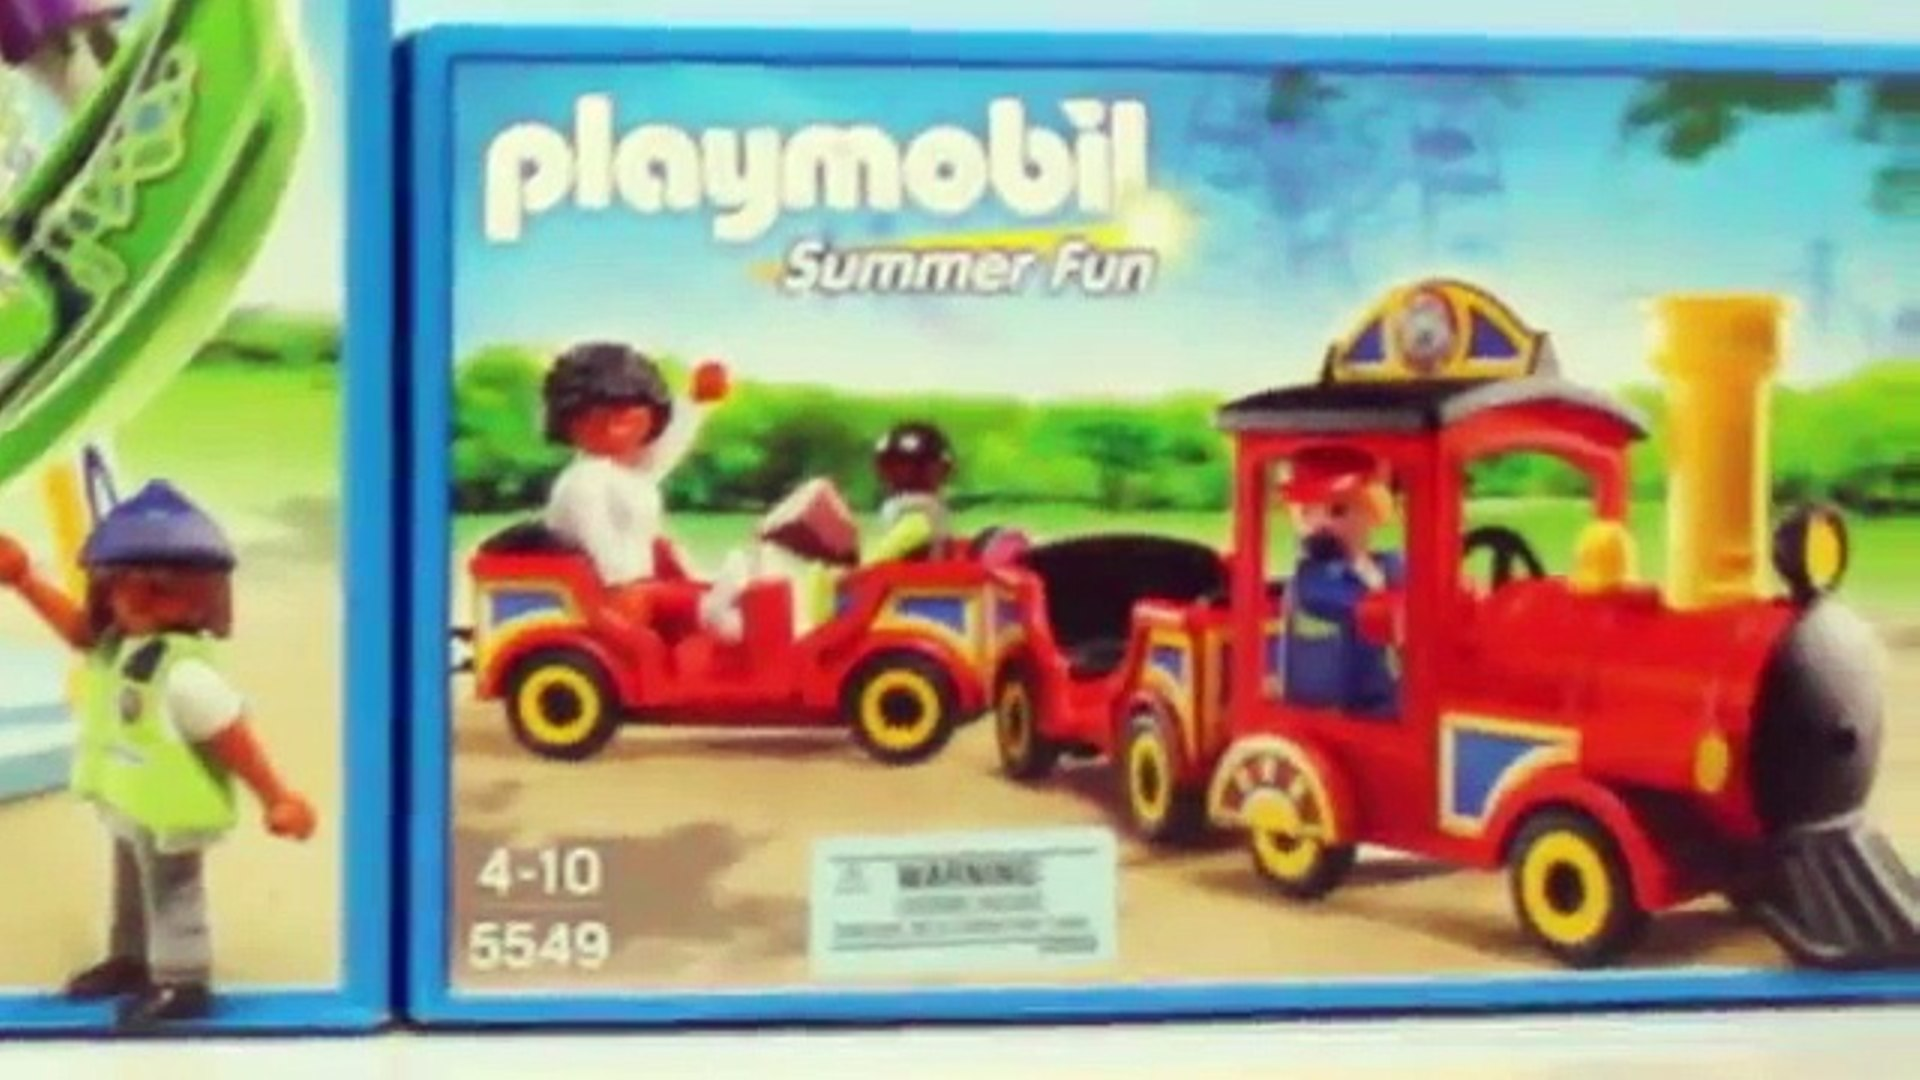 Playmobil 5549 summer fun amusement park children's train